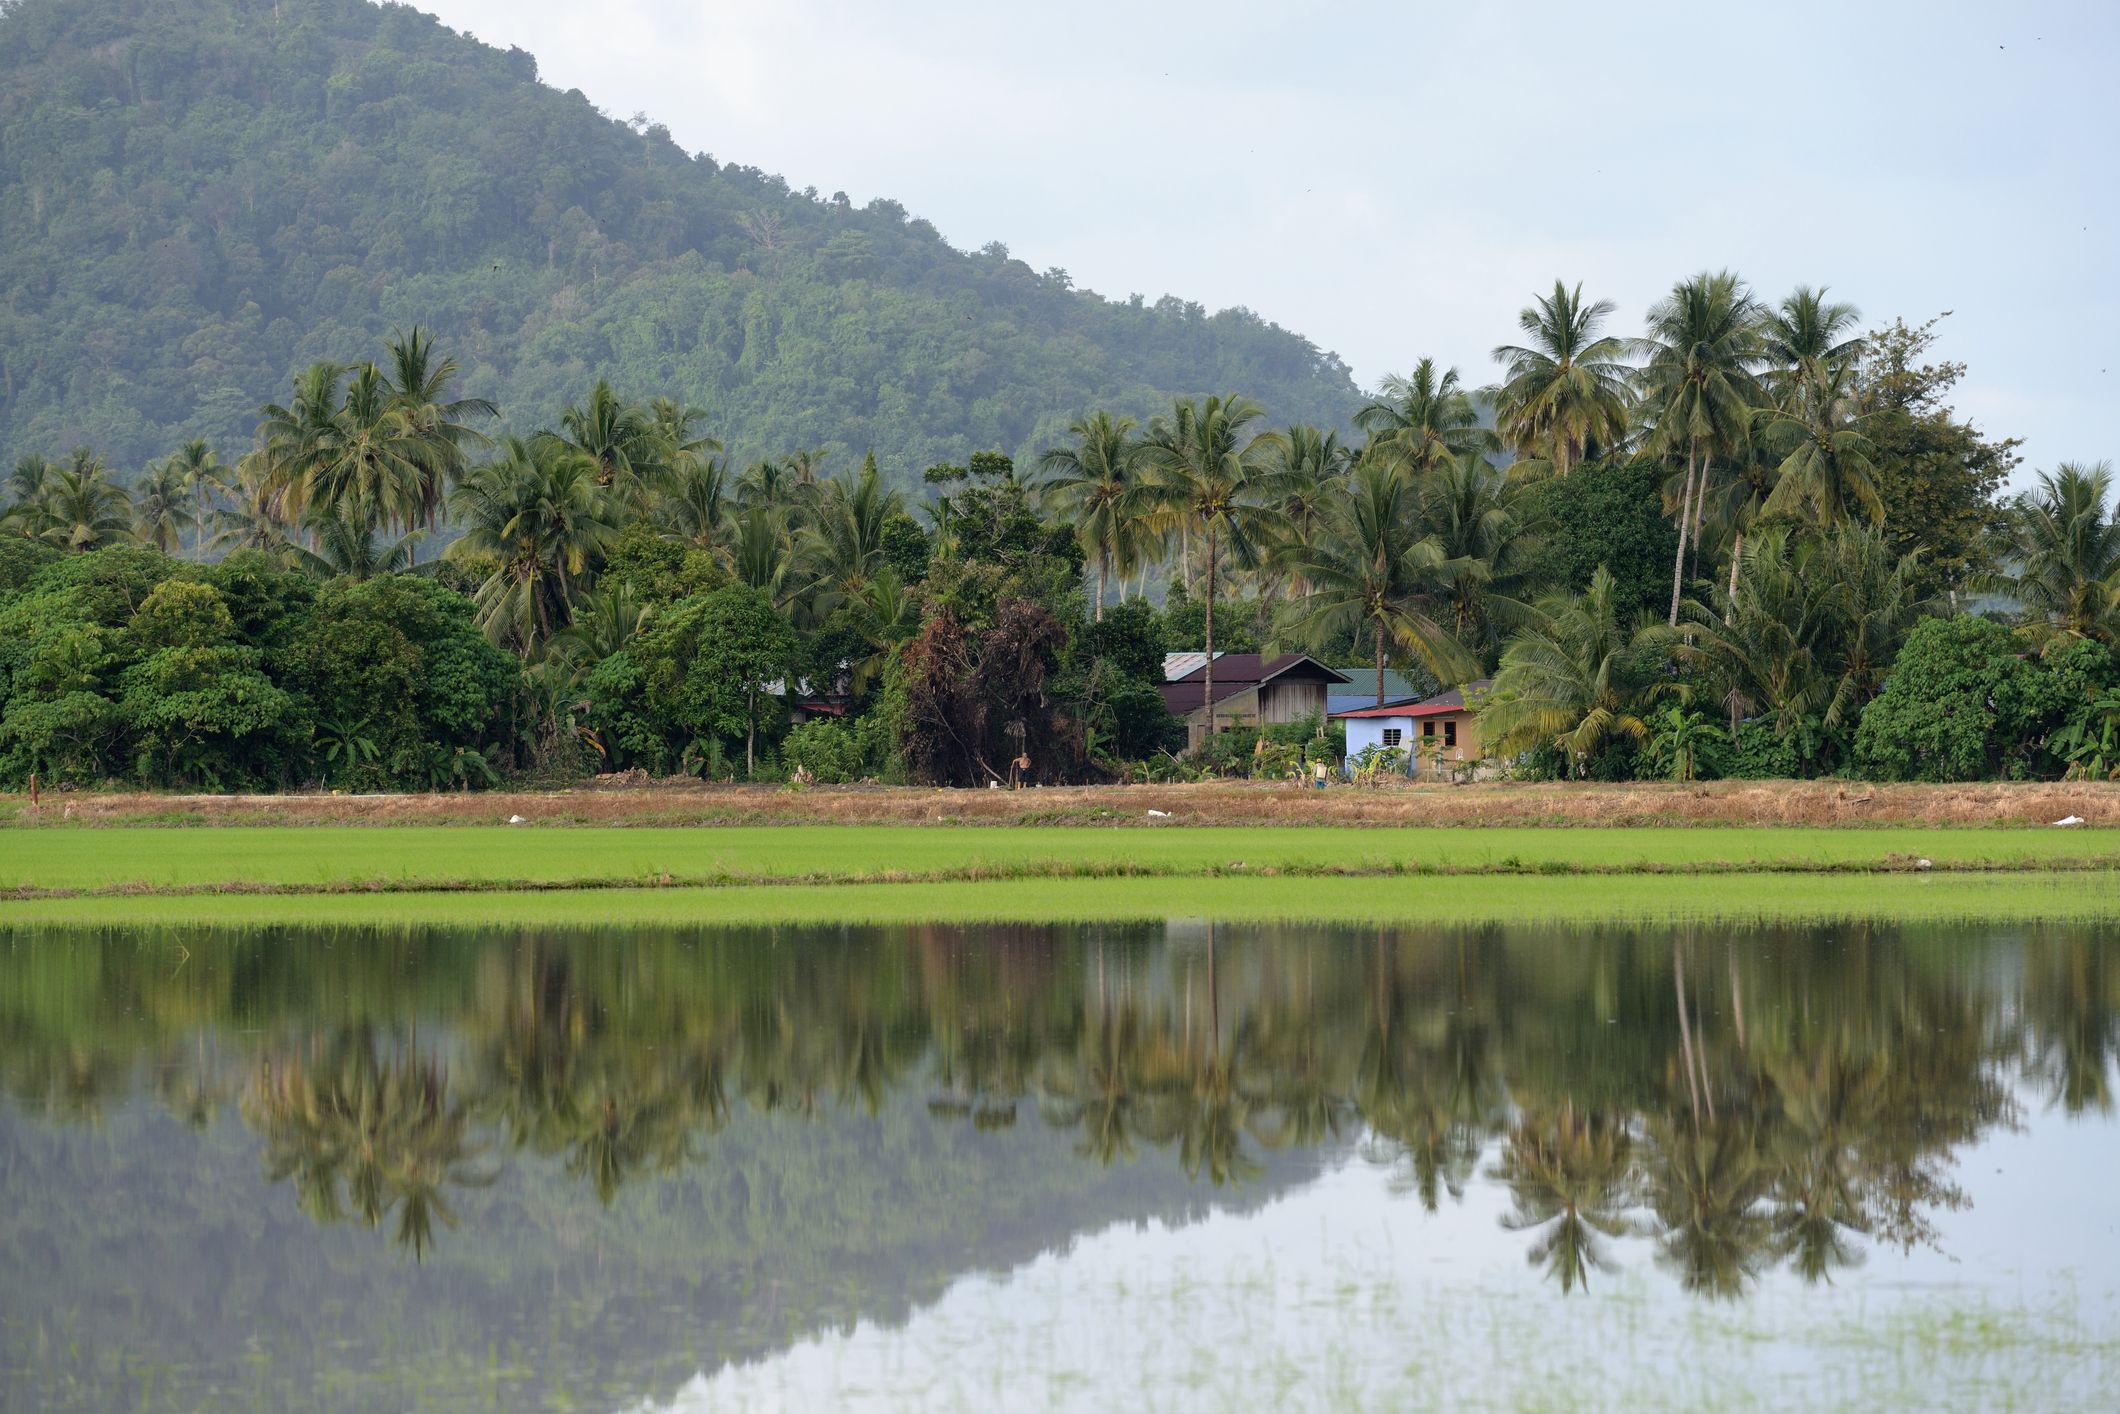 60 >> Balik Pulau Food, Travel, and Things to Do